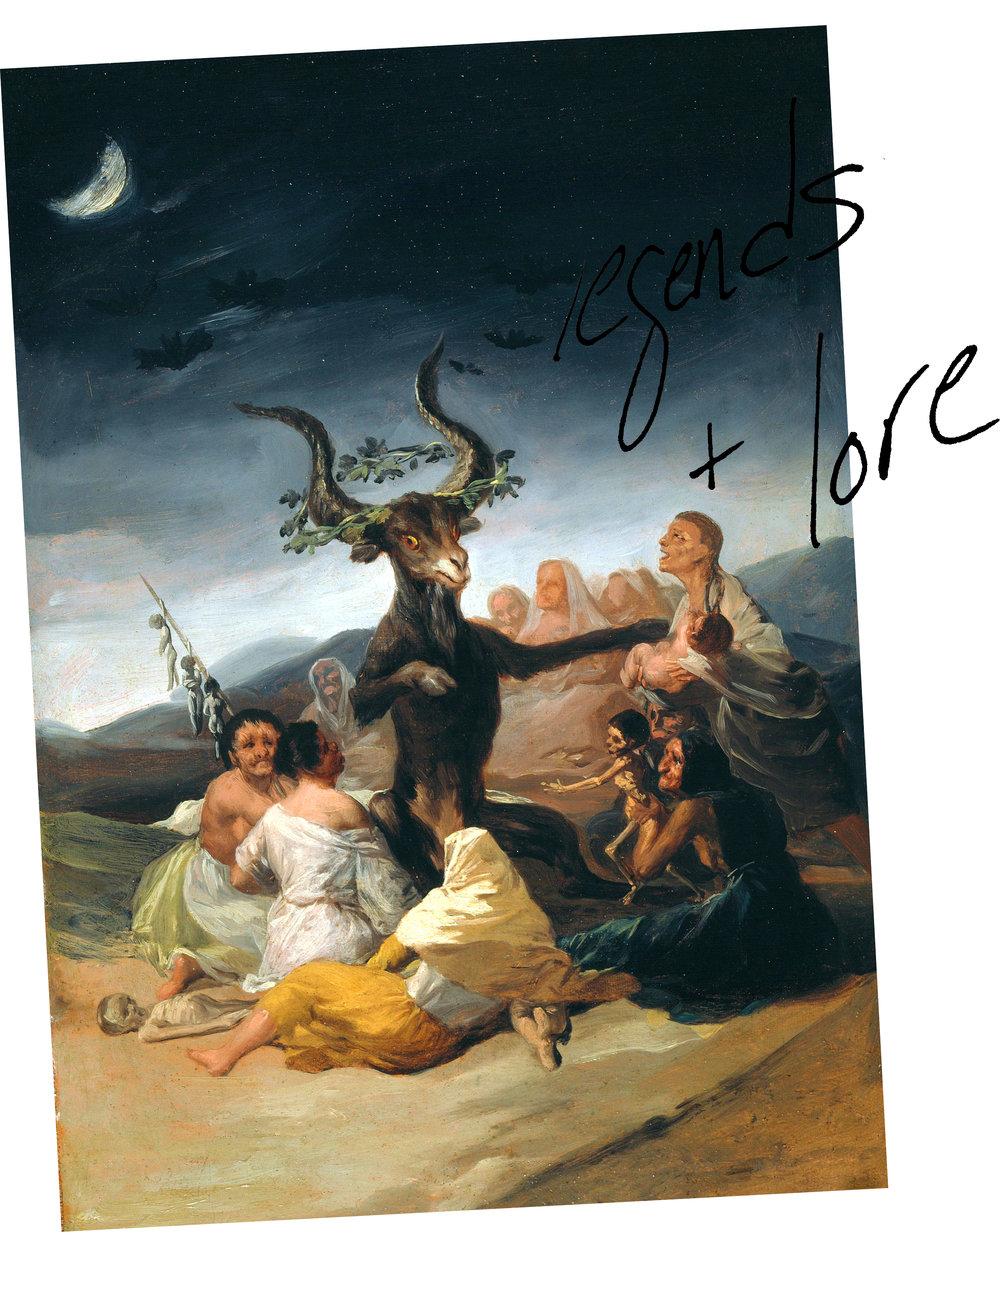 Francisco Goya,  Witches' Sabbath, 1798.